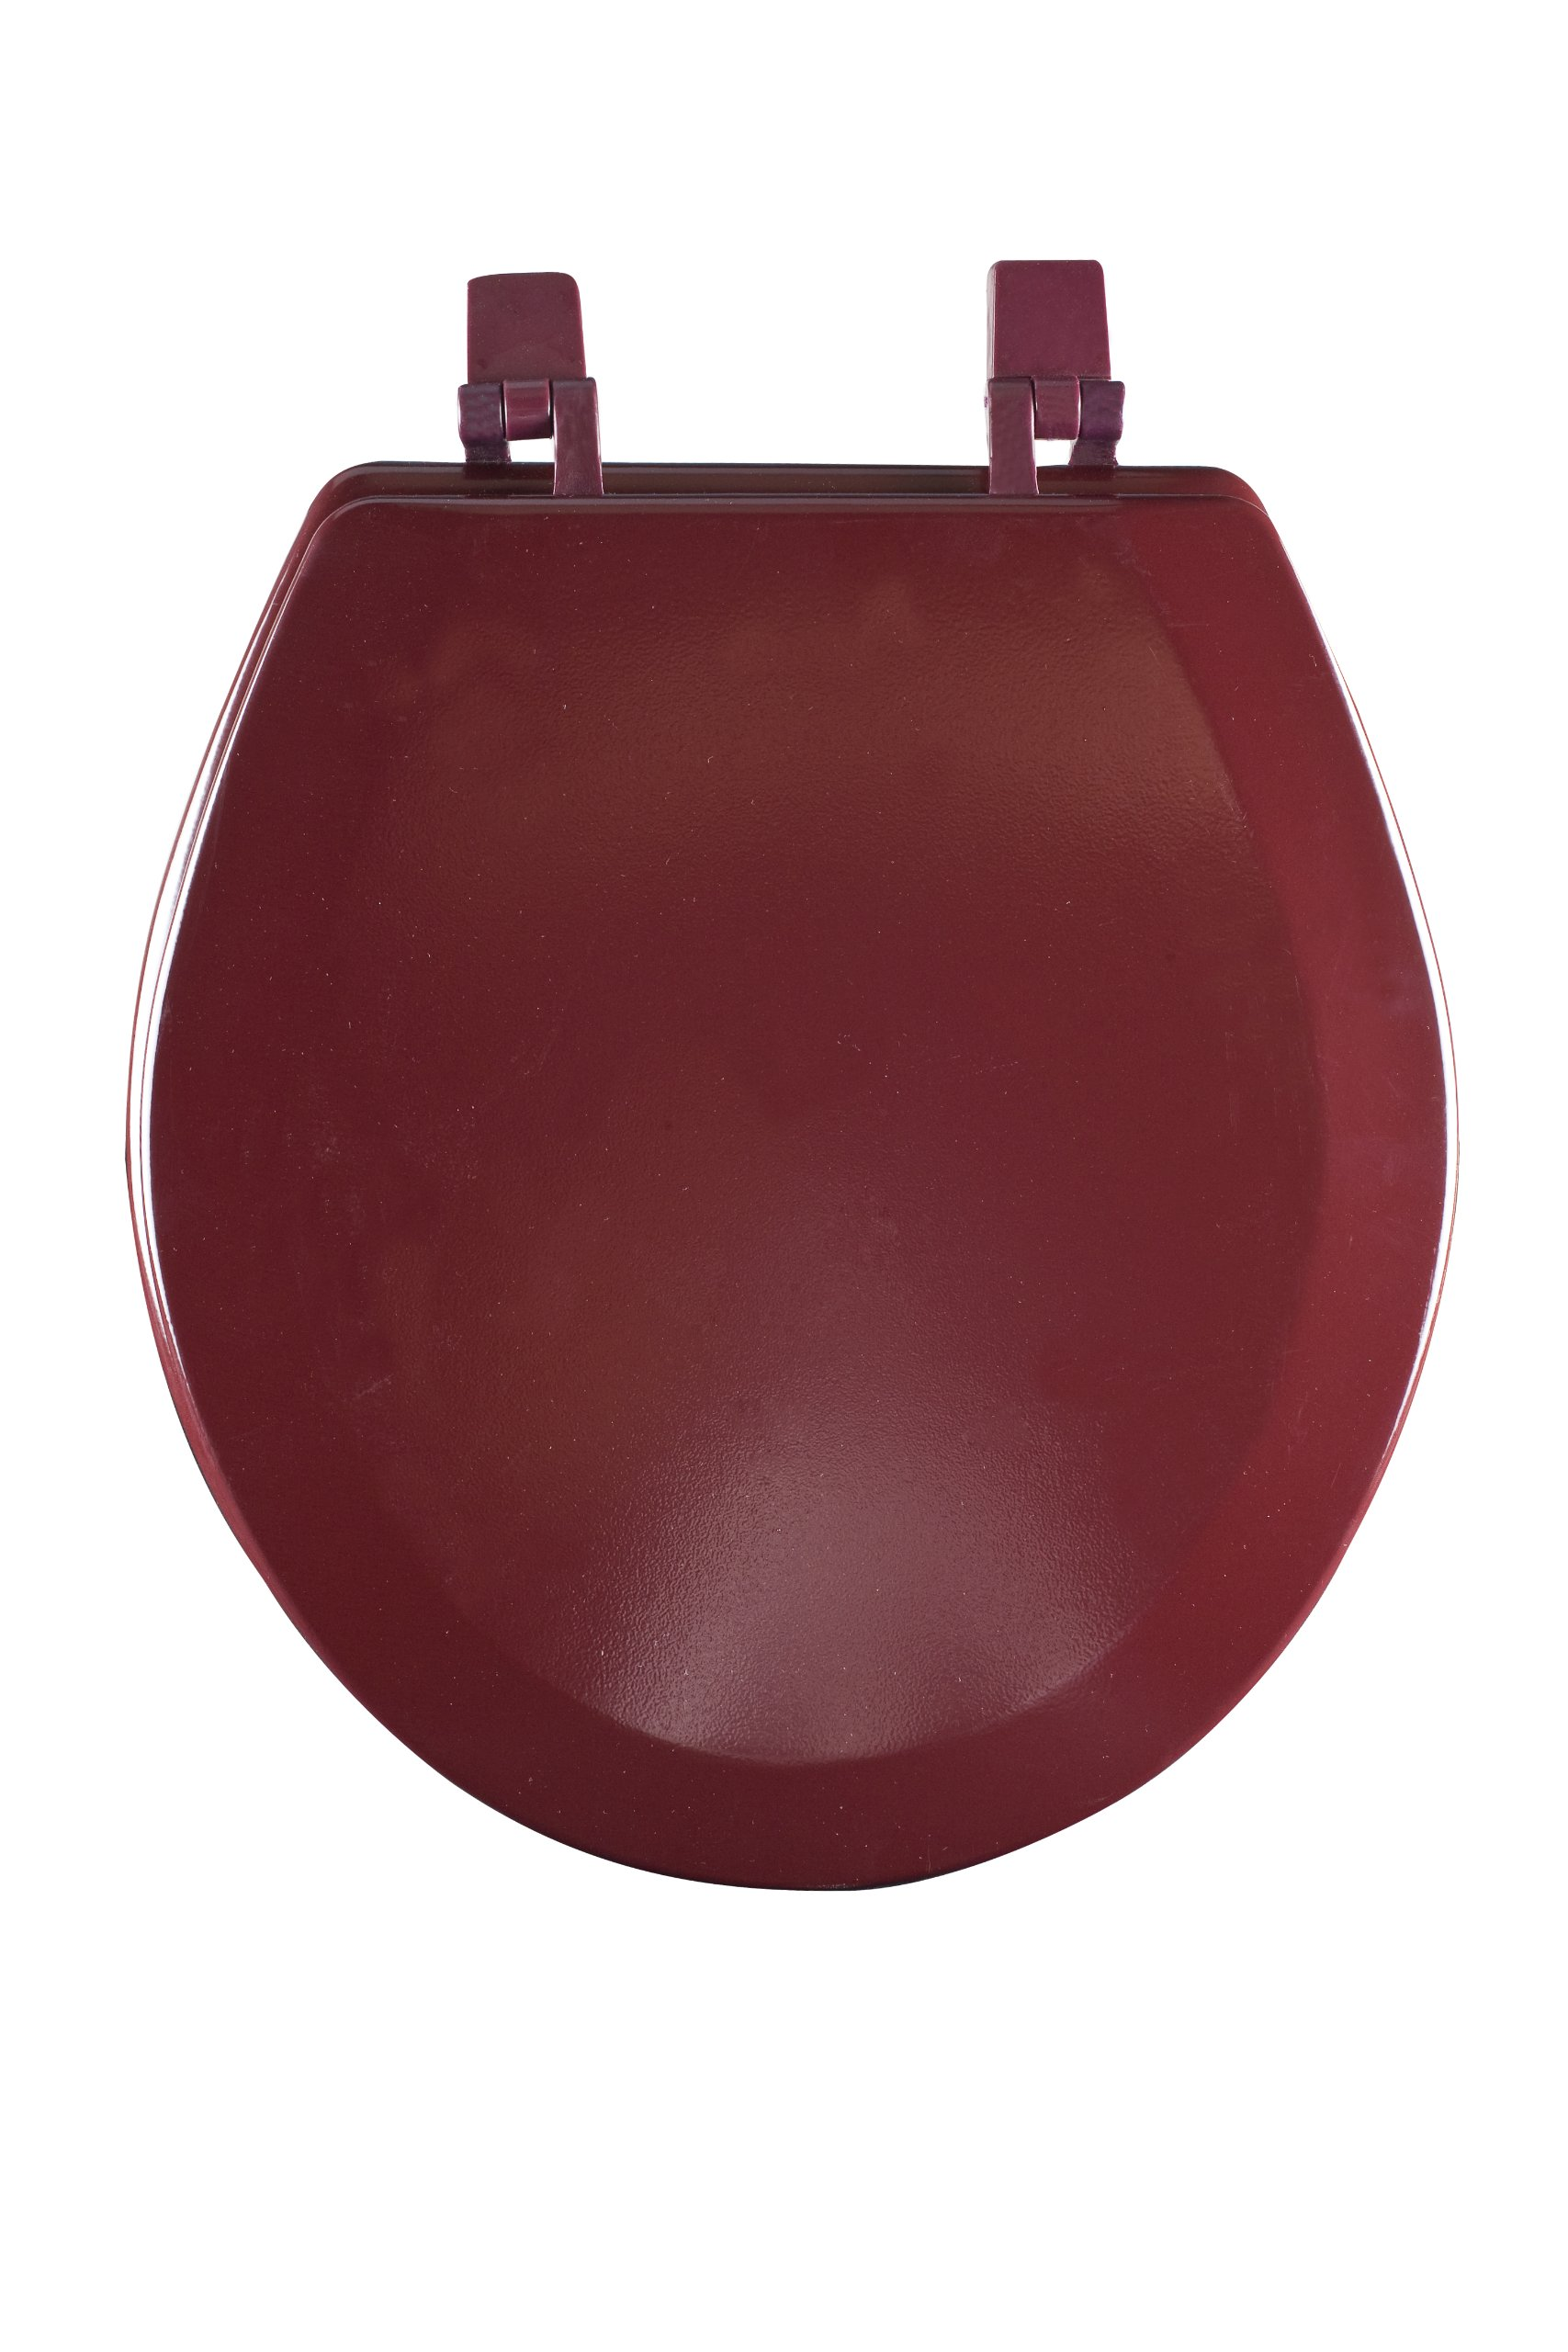 Achim Home Furnishings TOWDSTBU04 17-Inch Fantasia Standard Toilet Seat, Wood Burgundy